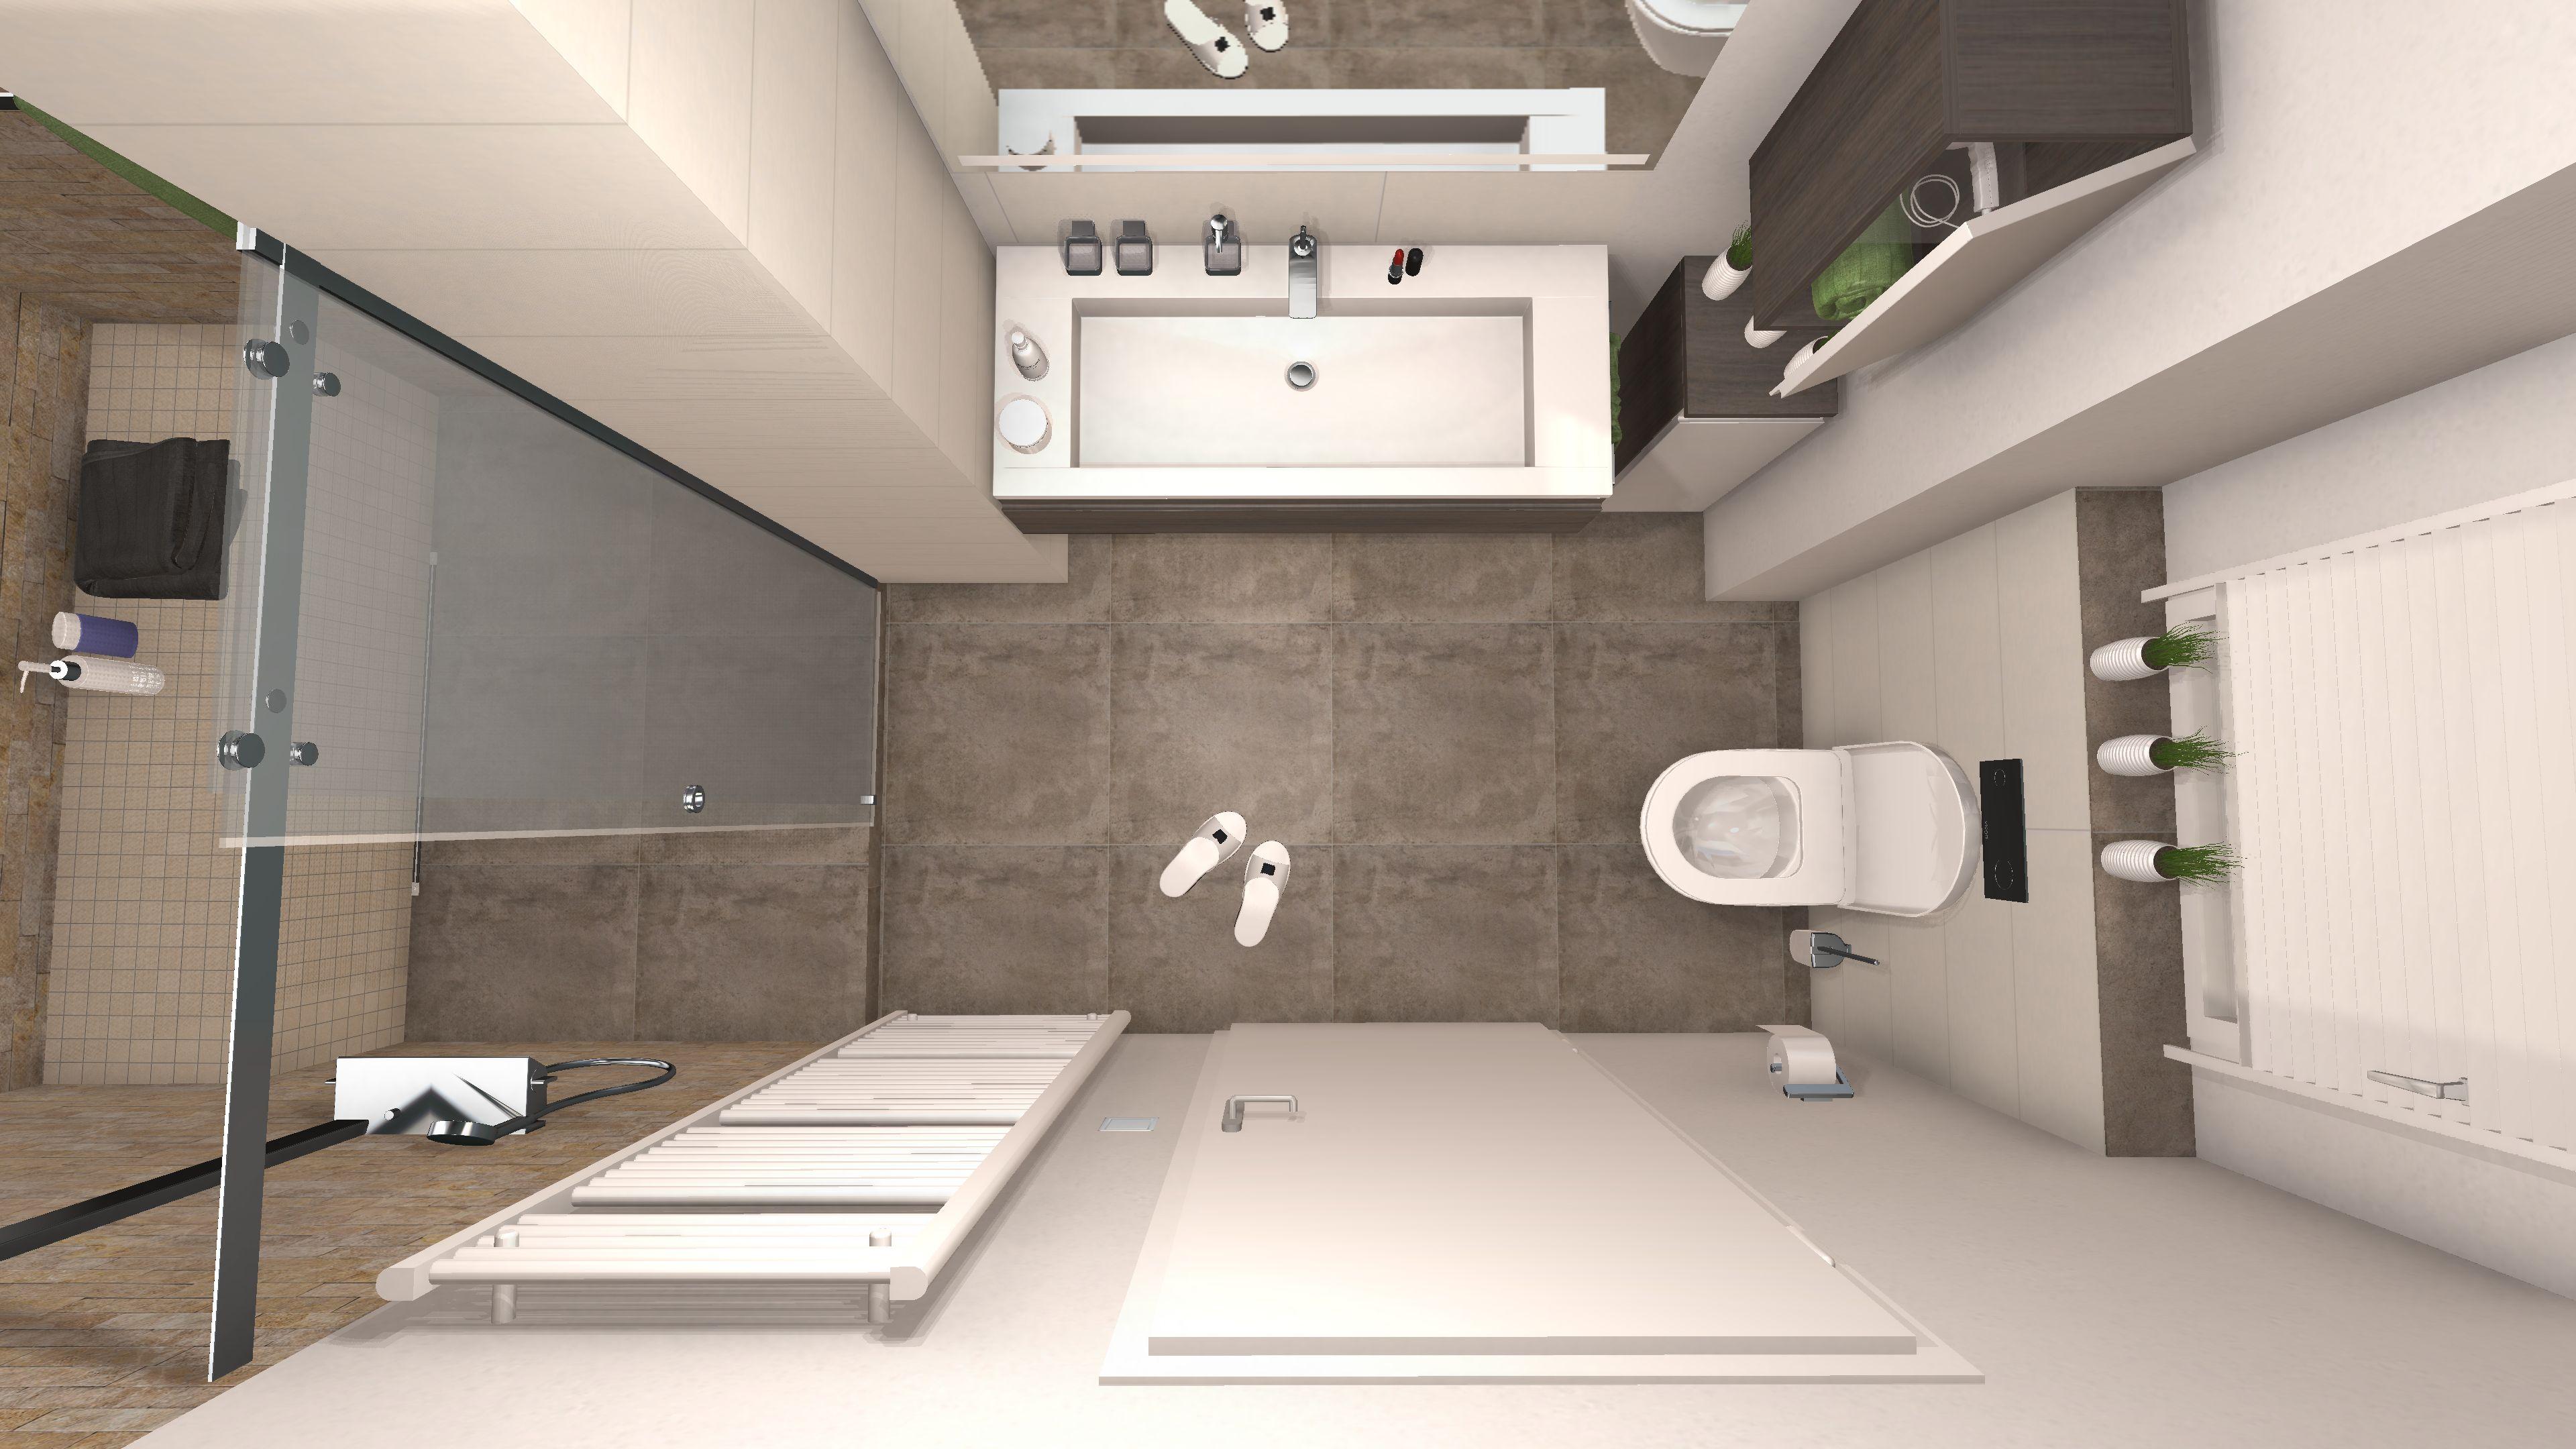 bad planung interior design und m bel ideen. Black Bedroom Furniture Sets. Home Design Ideas